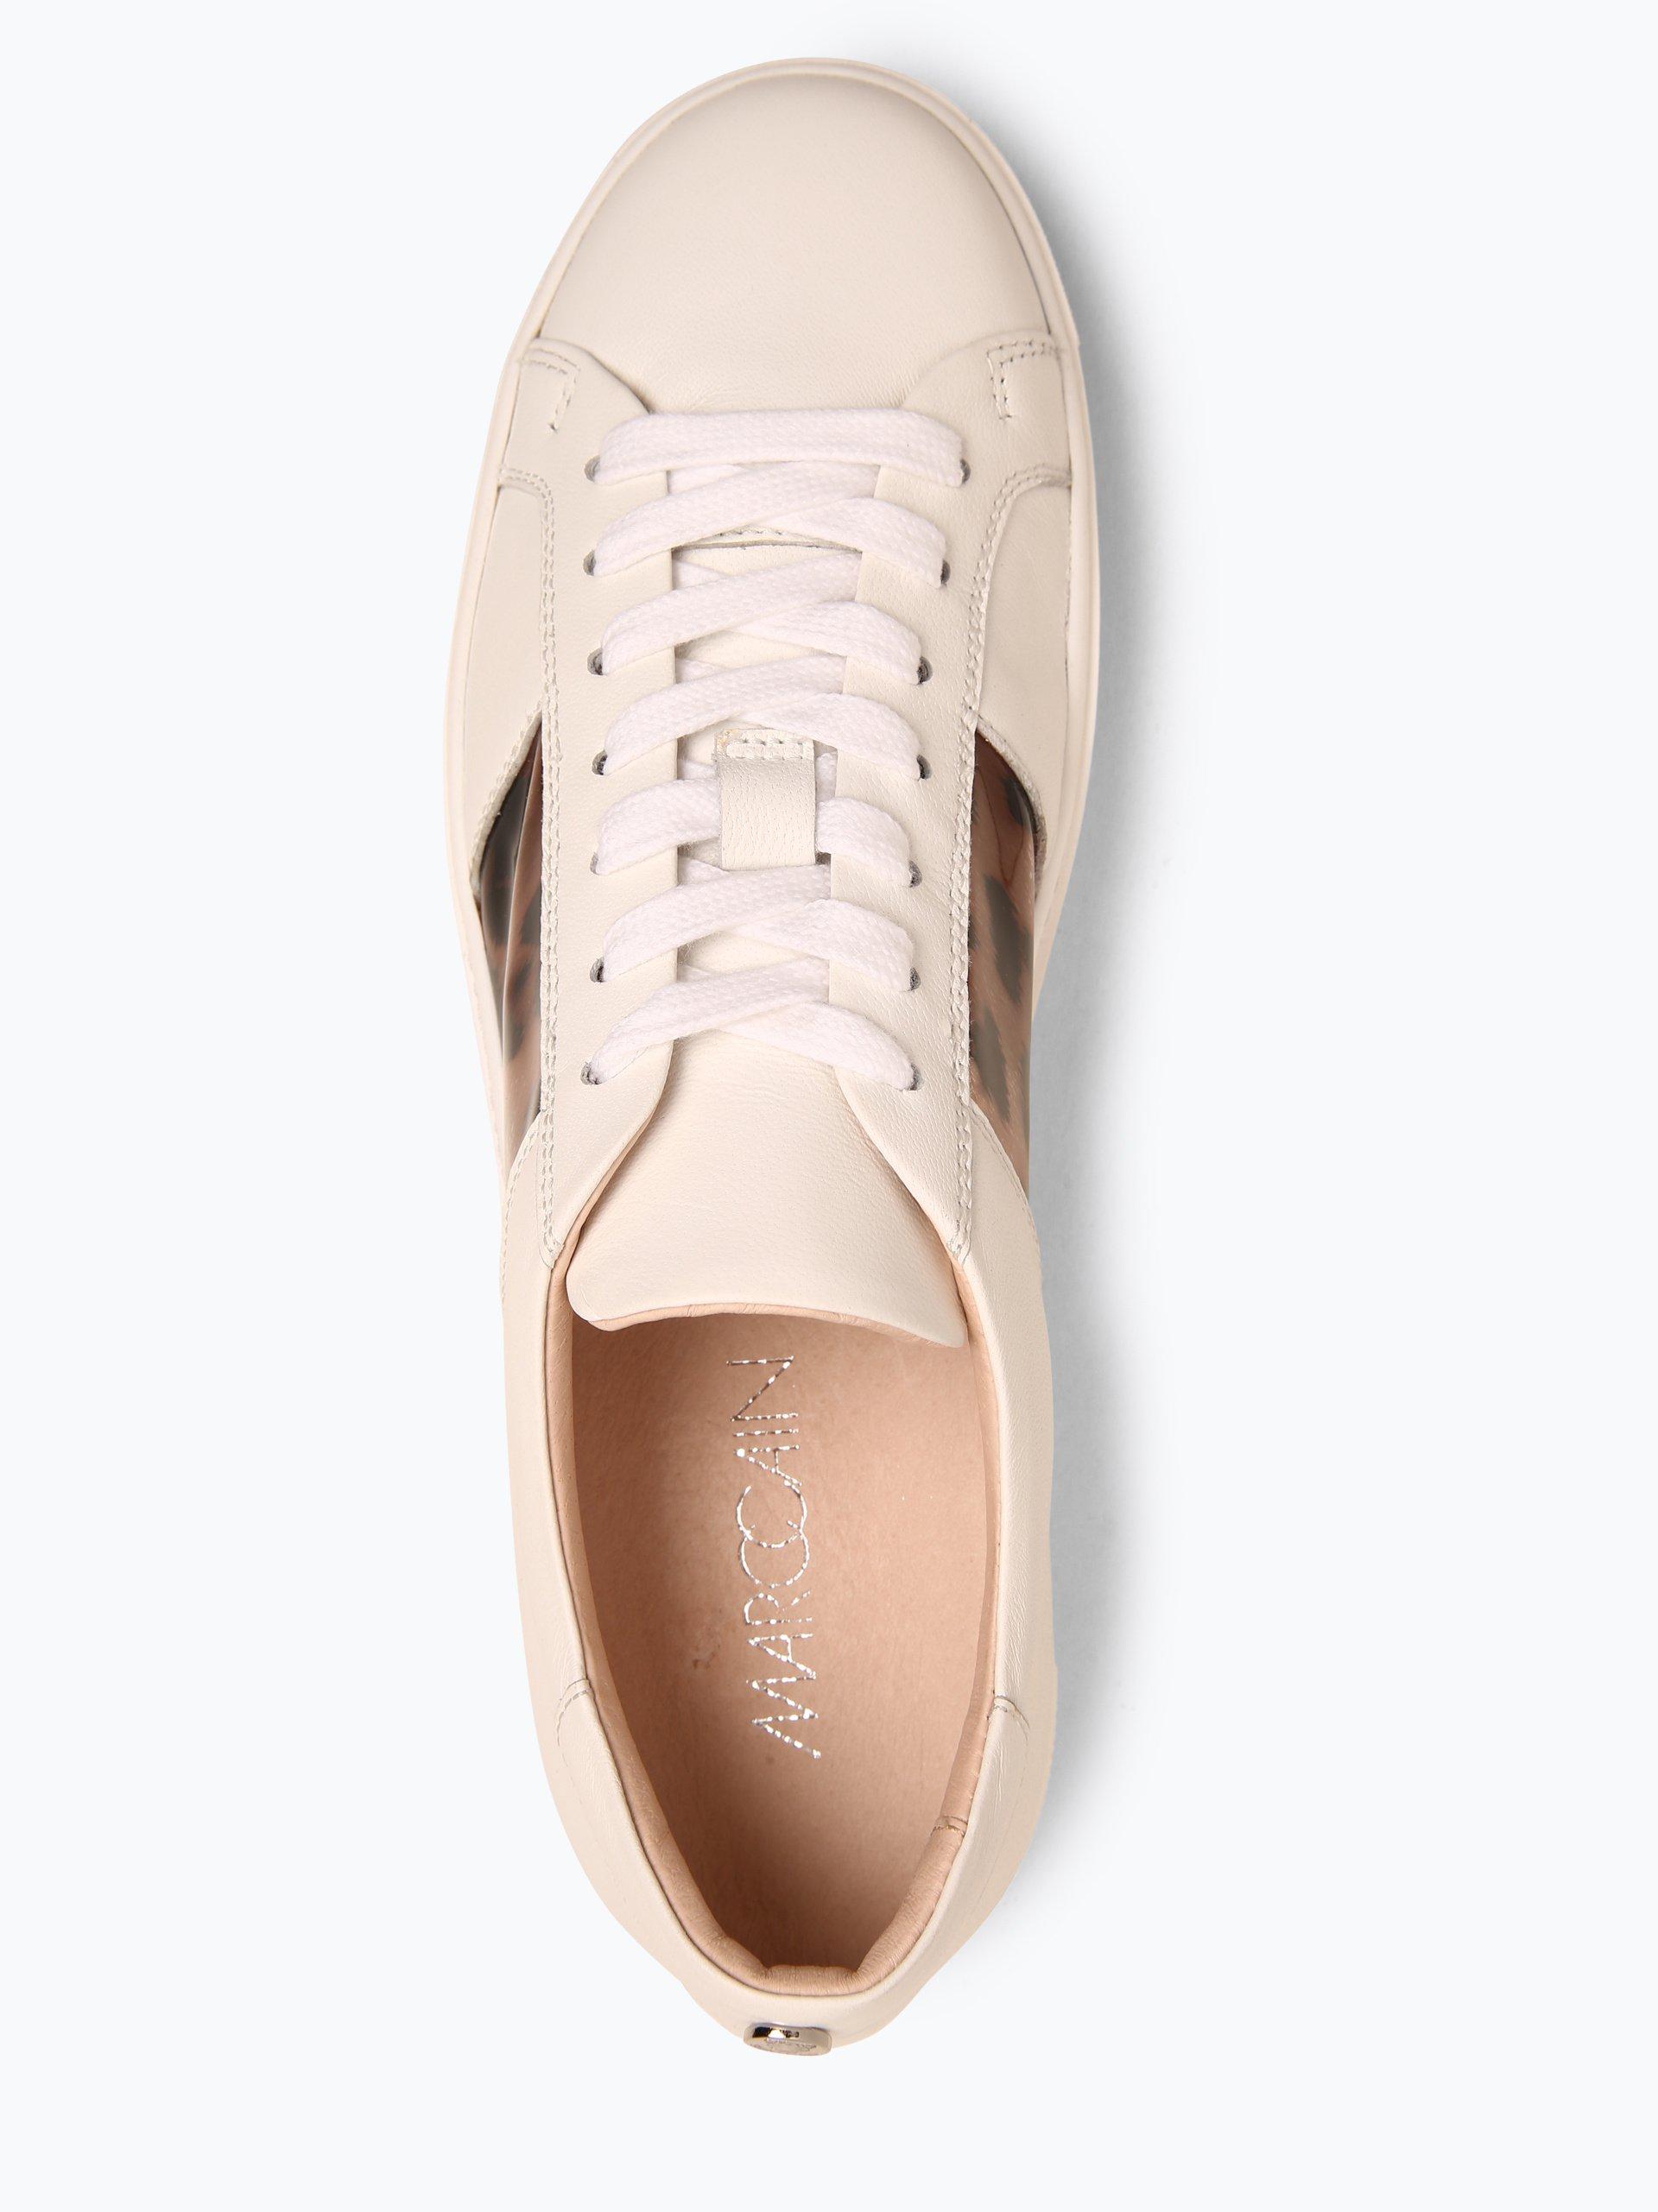 Marc Cain Bags & Shoes Damskie tenisówki ze skóry